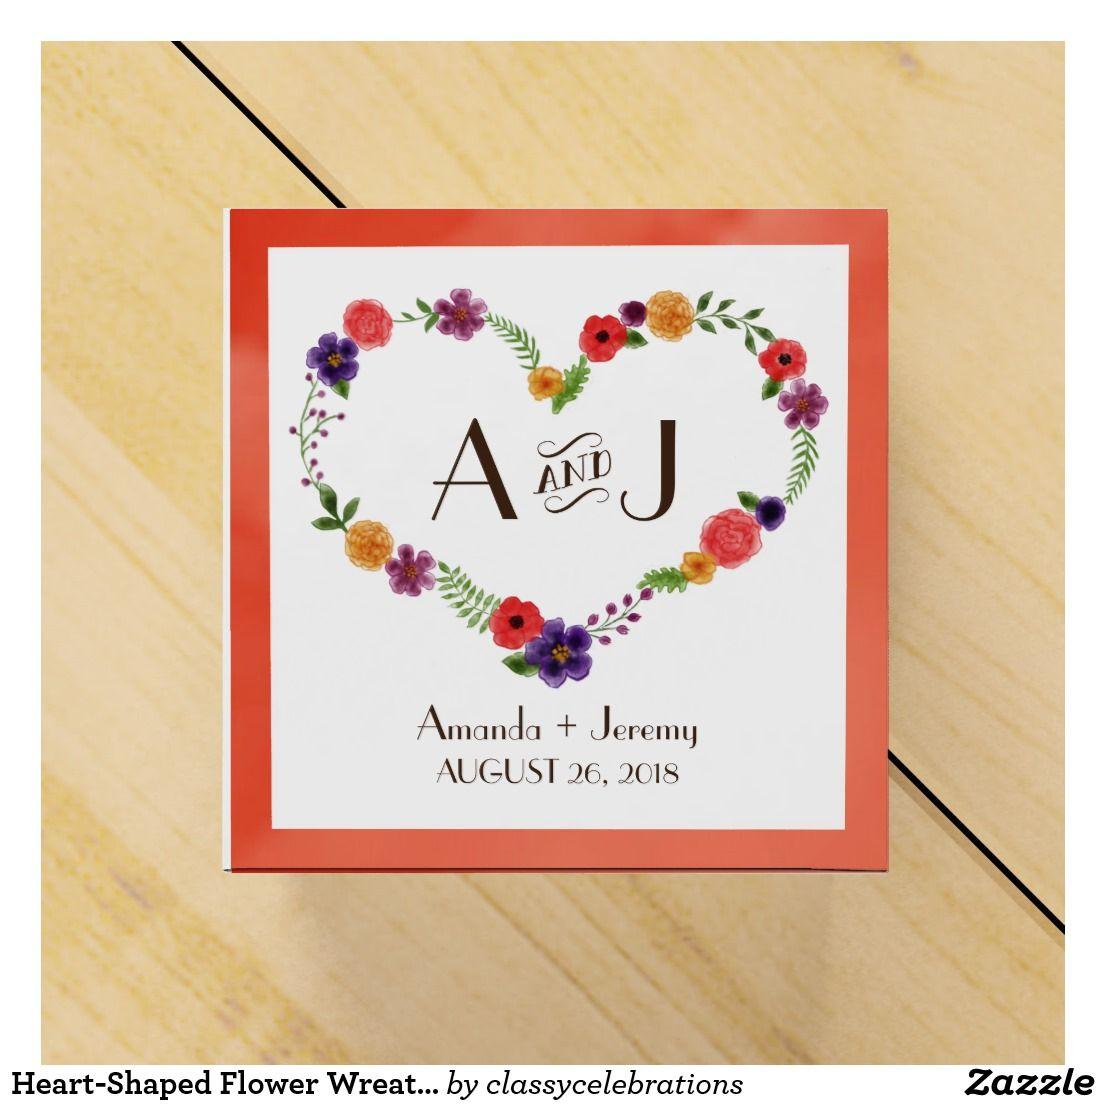 Heart-Shaped Flower Wreath Rustic Wedding Favor Box | Rustic wedding ...